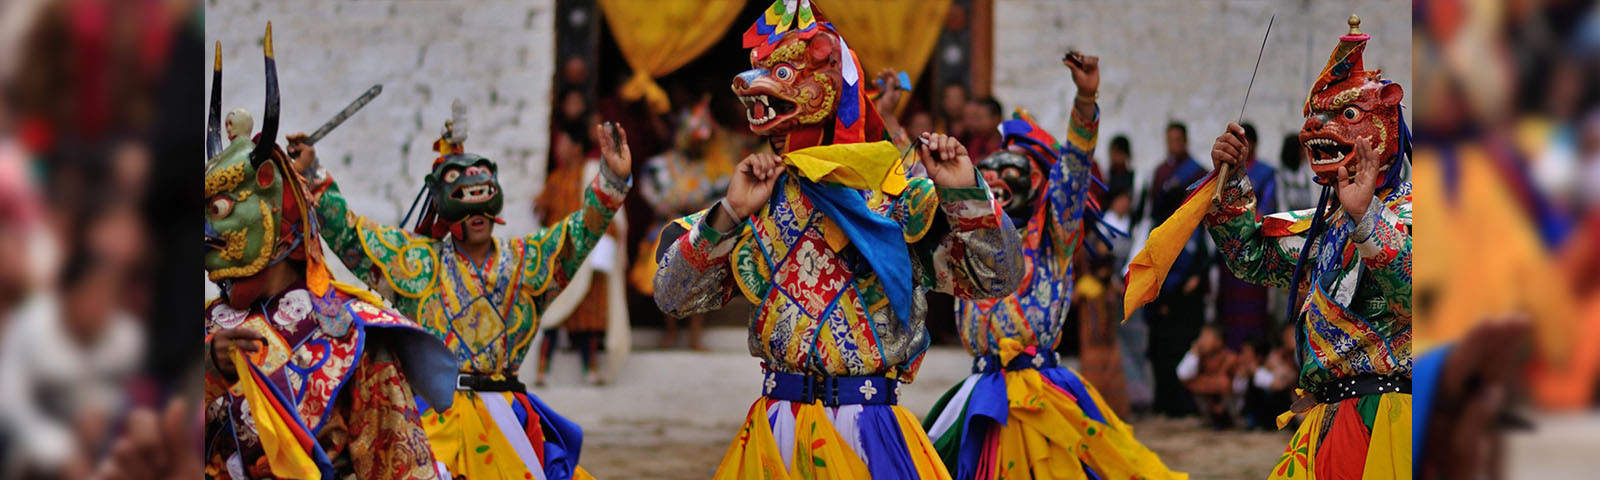 Bhutan Festival Dates 2022